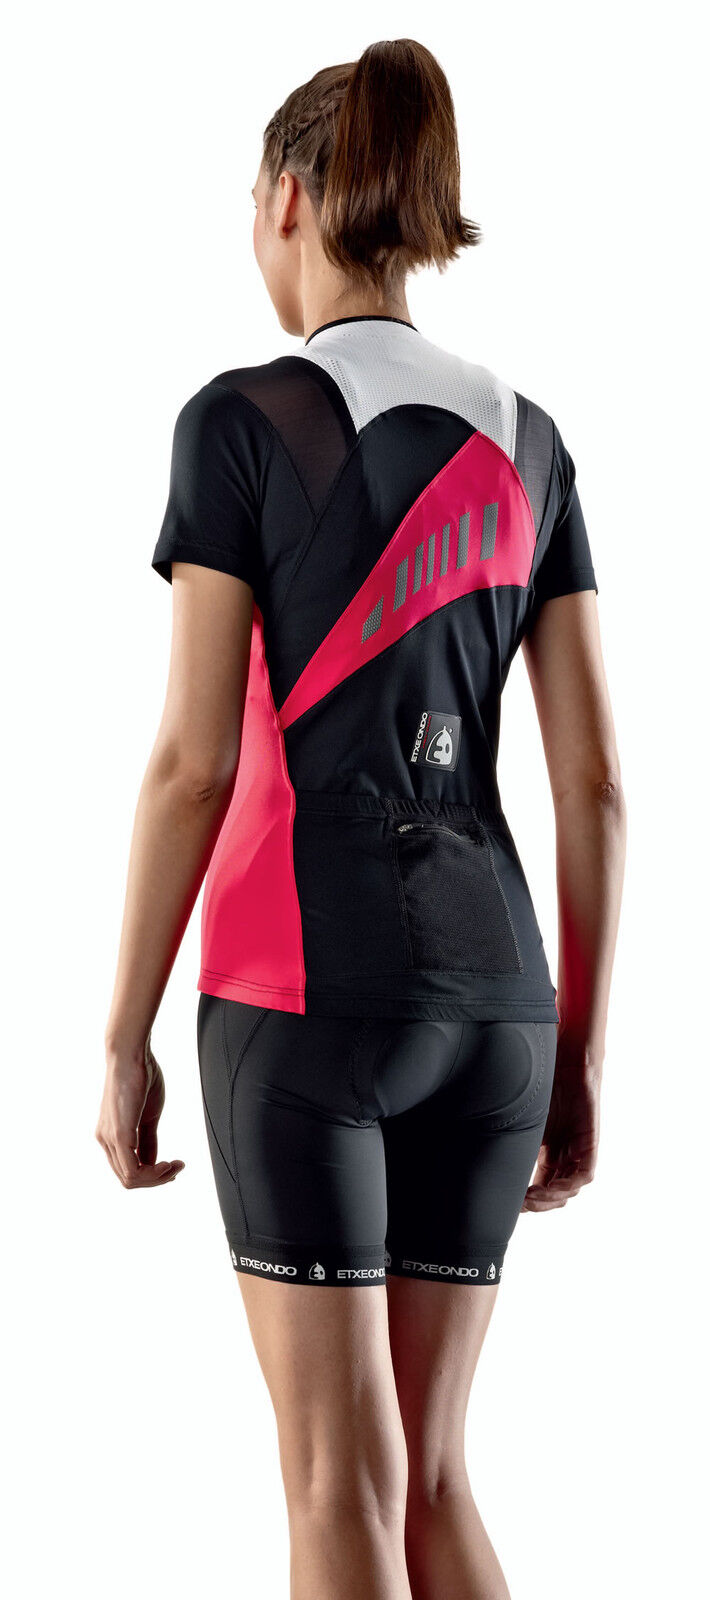 ETXEONDO Kaxu Women's CYCLING short sleeve Jersey in pink (Made in Spain)